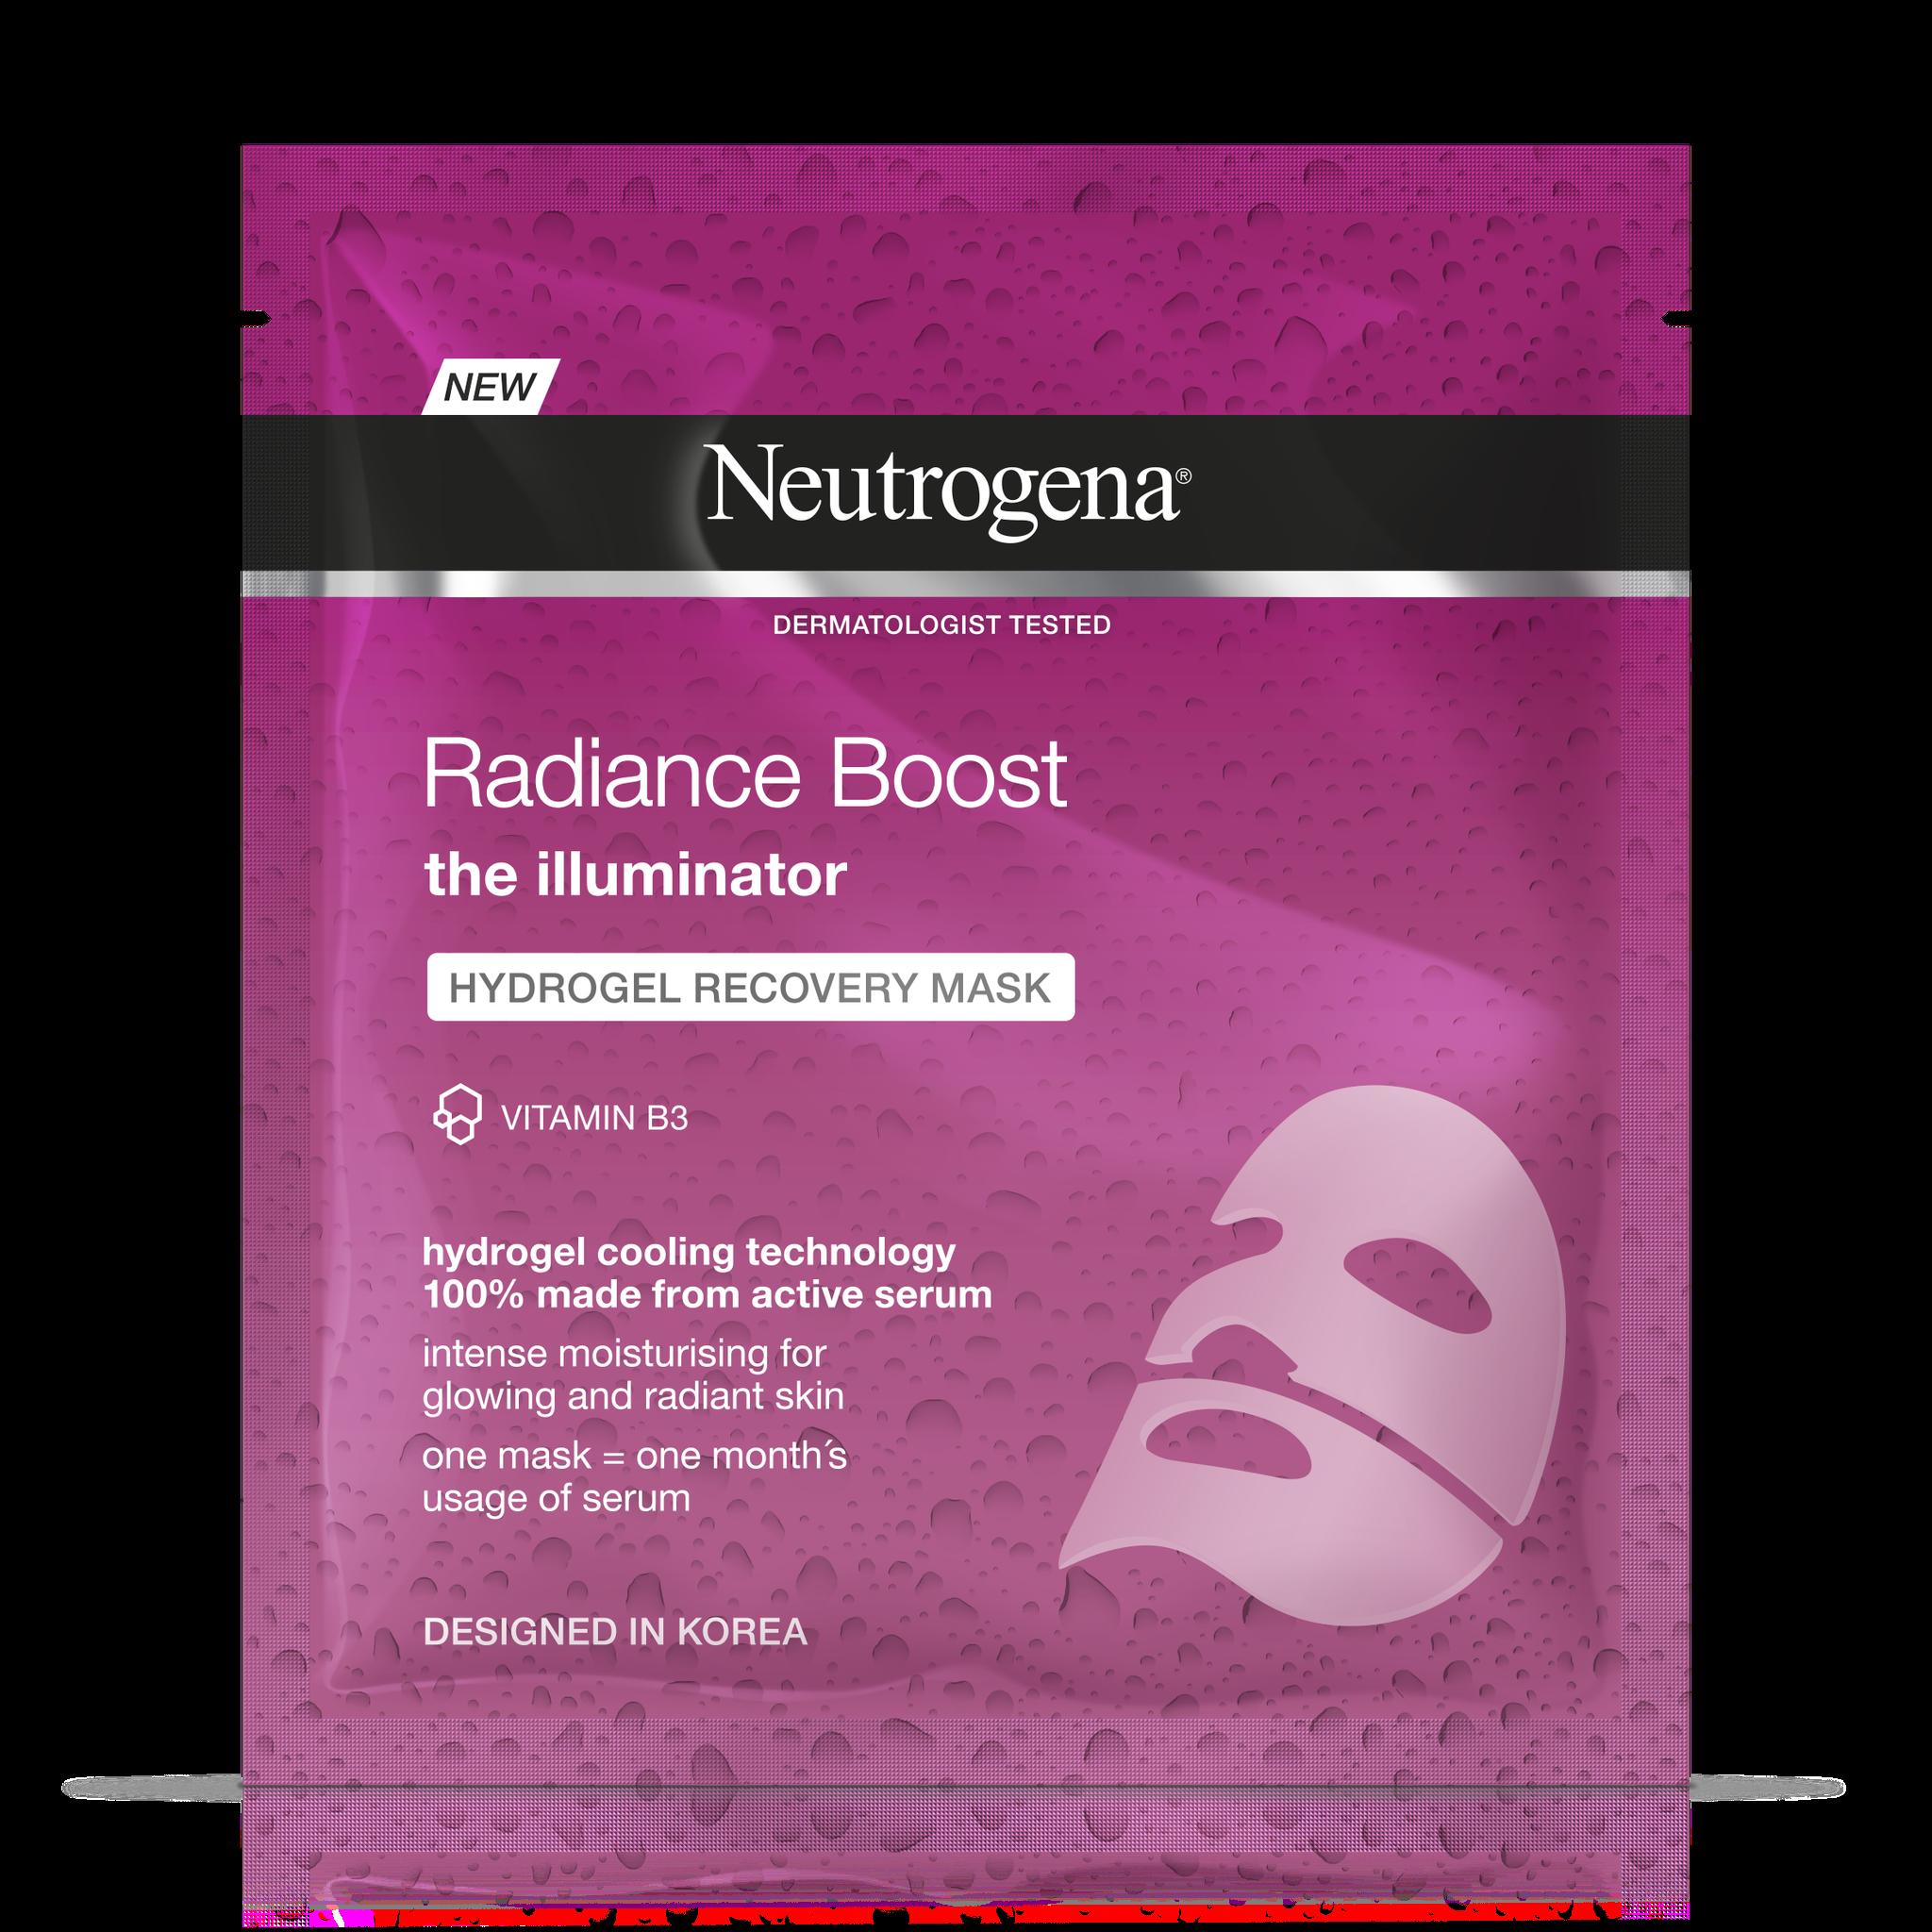 Neutrogena Radiance Boost Hydrogel Mask Review | POPSUGAR Beauty UK